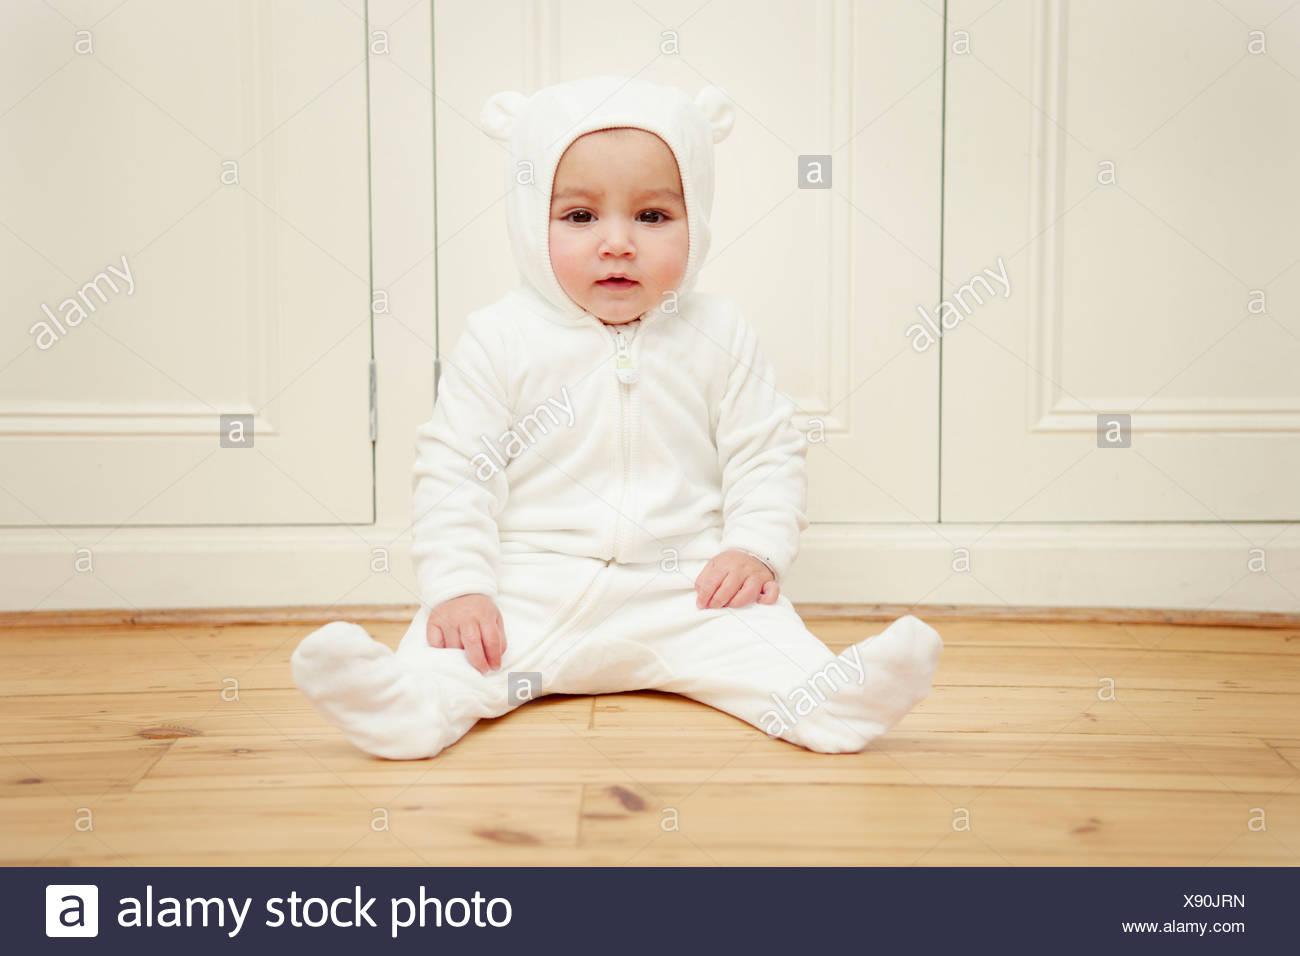 Baby sitting wearing bear babygro Photo Stock